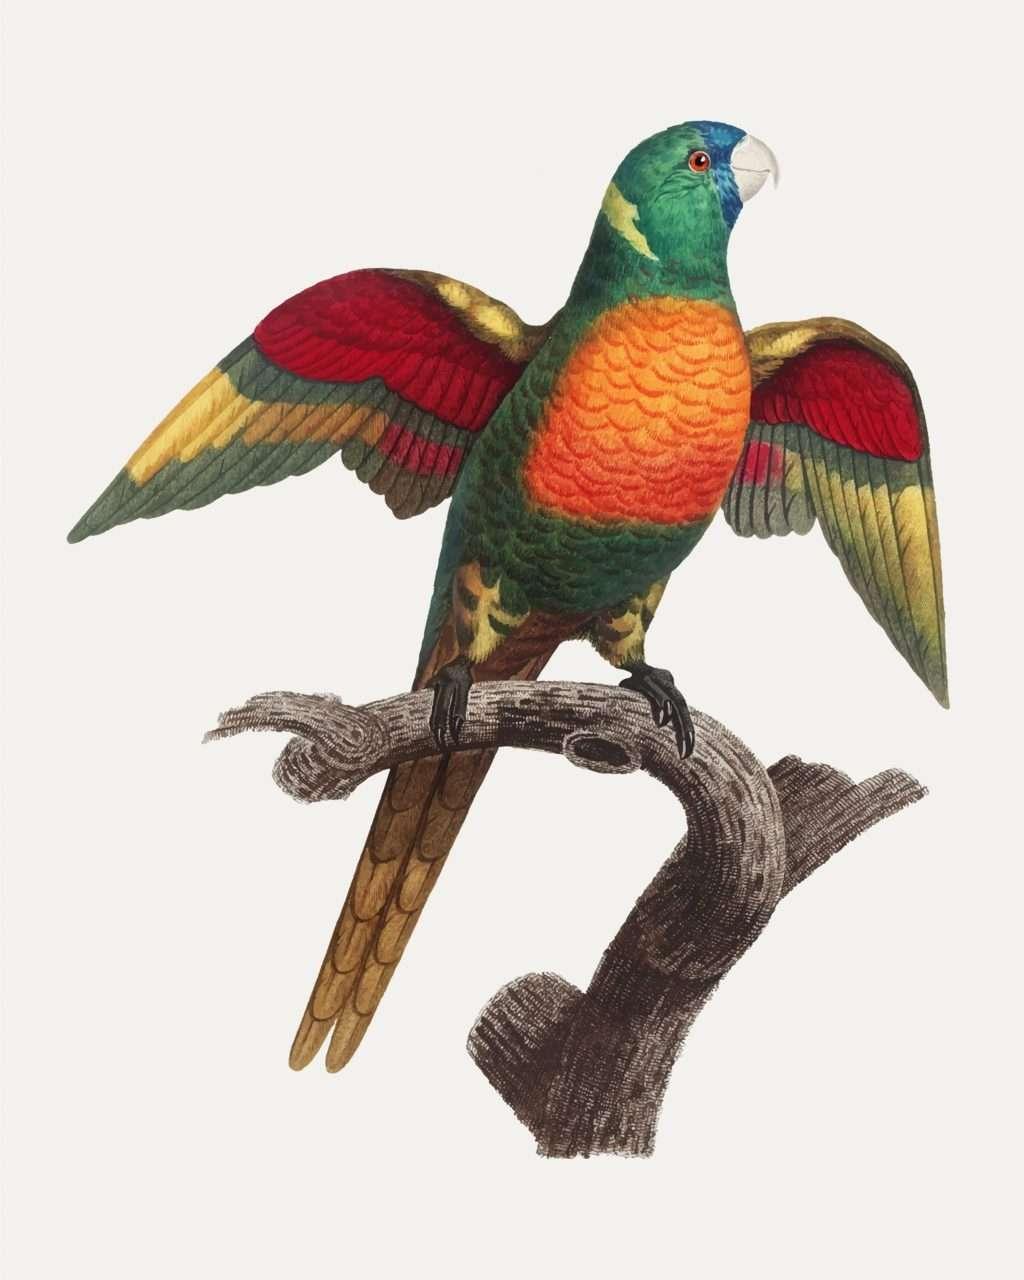 Blue-headed pionus parrot